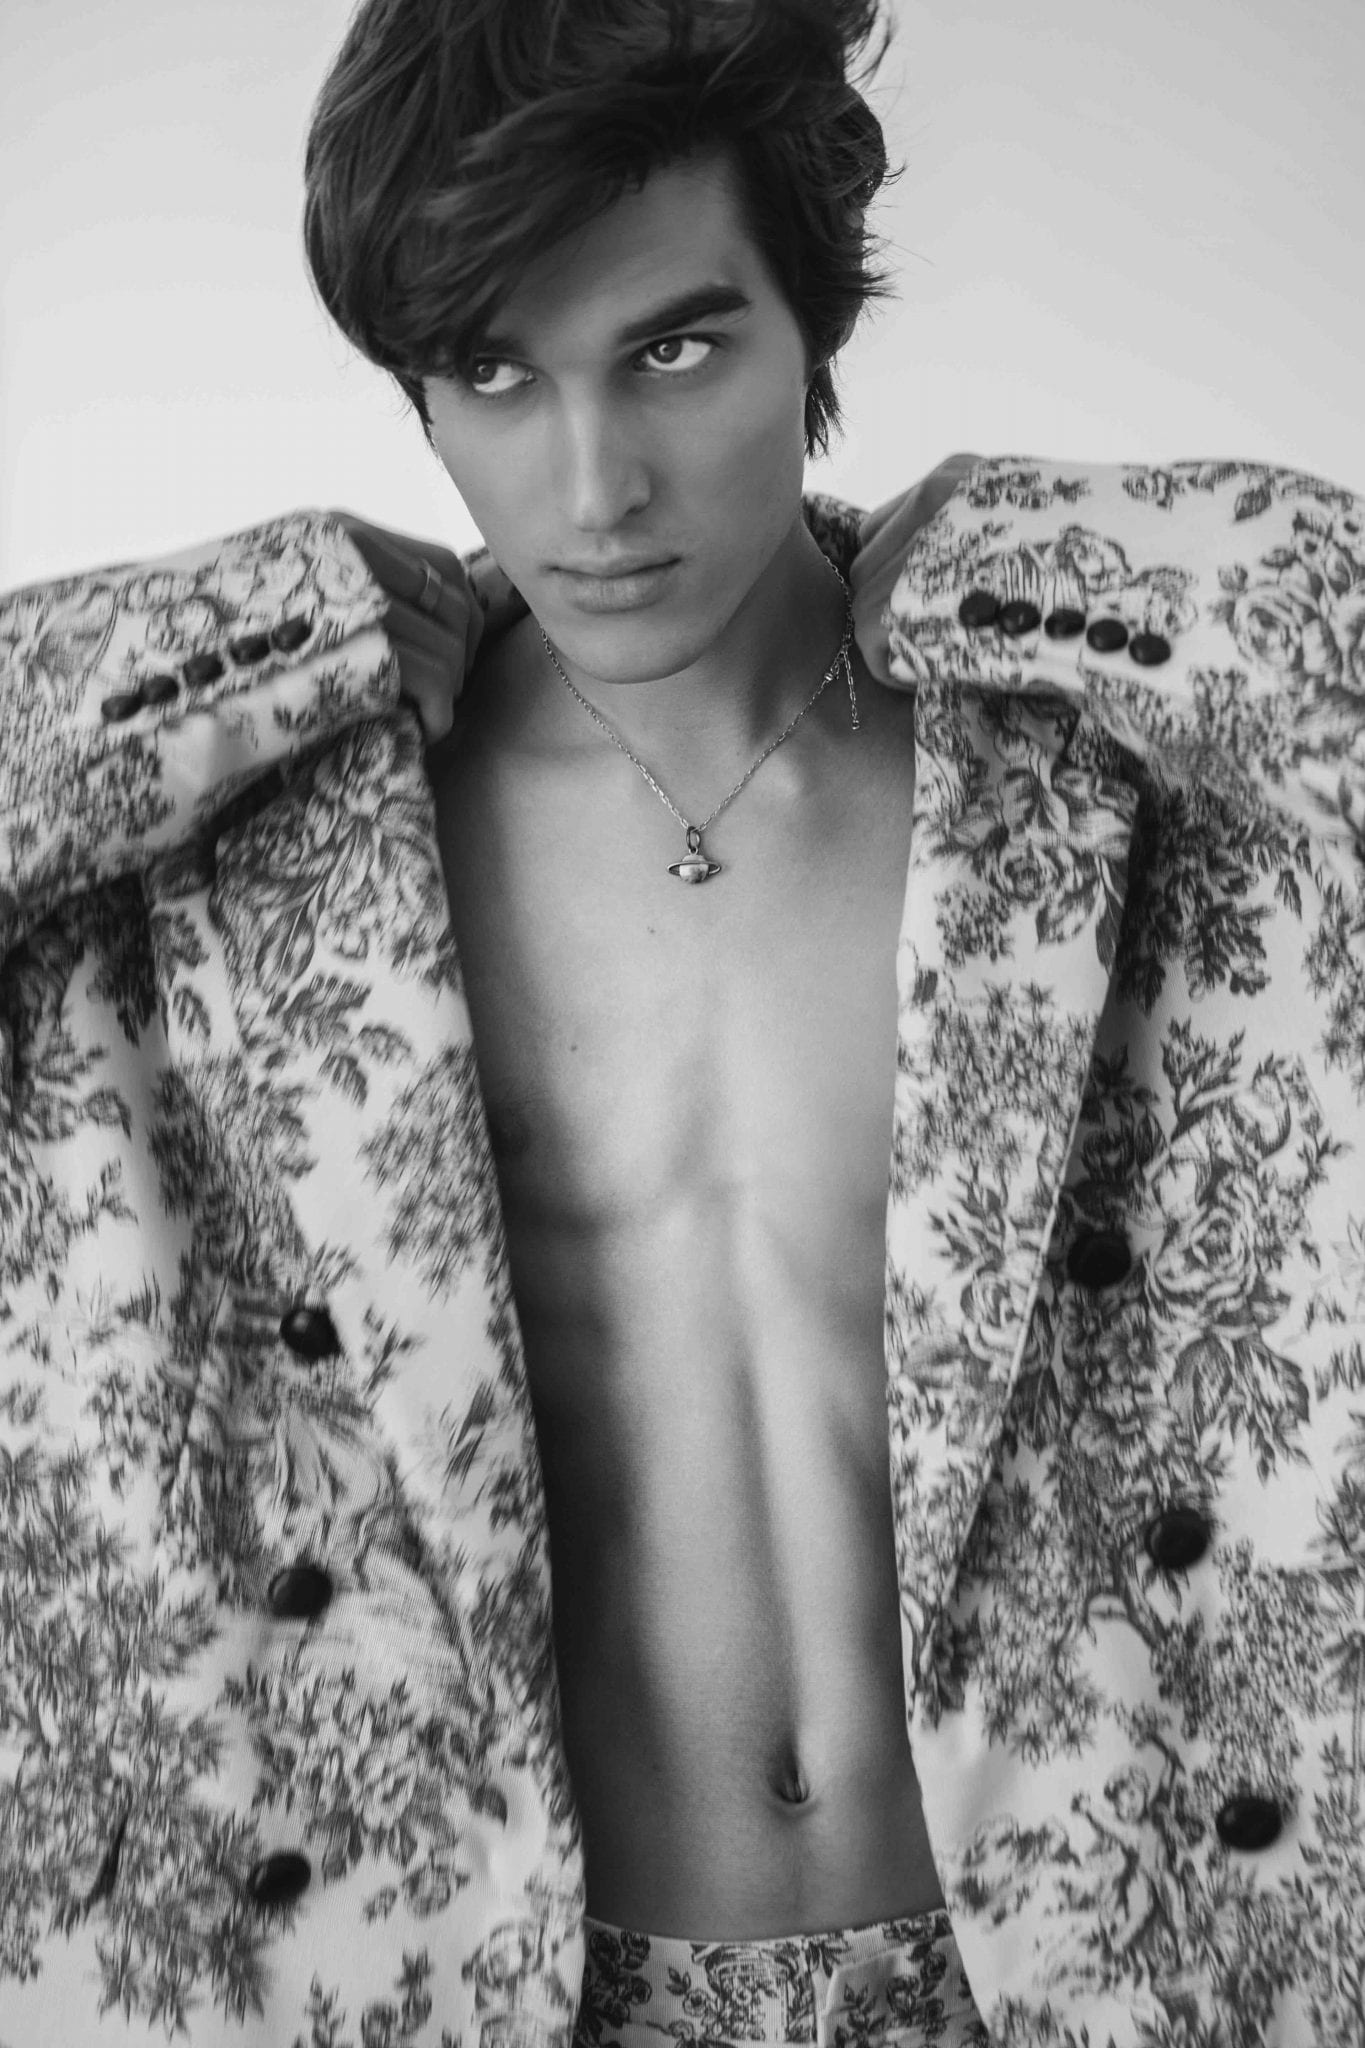 Total look Angelos Frentzos, necklace Vivienne Westwood model's own